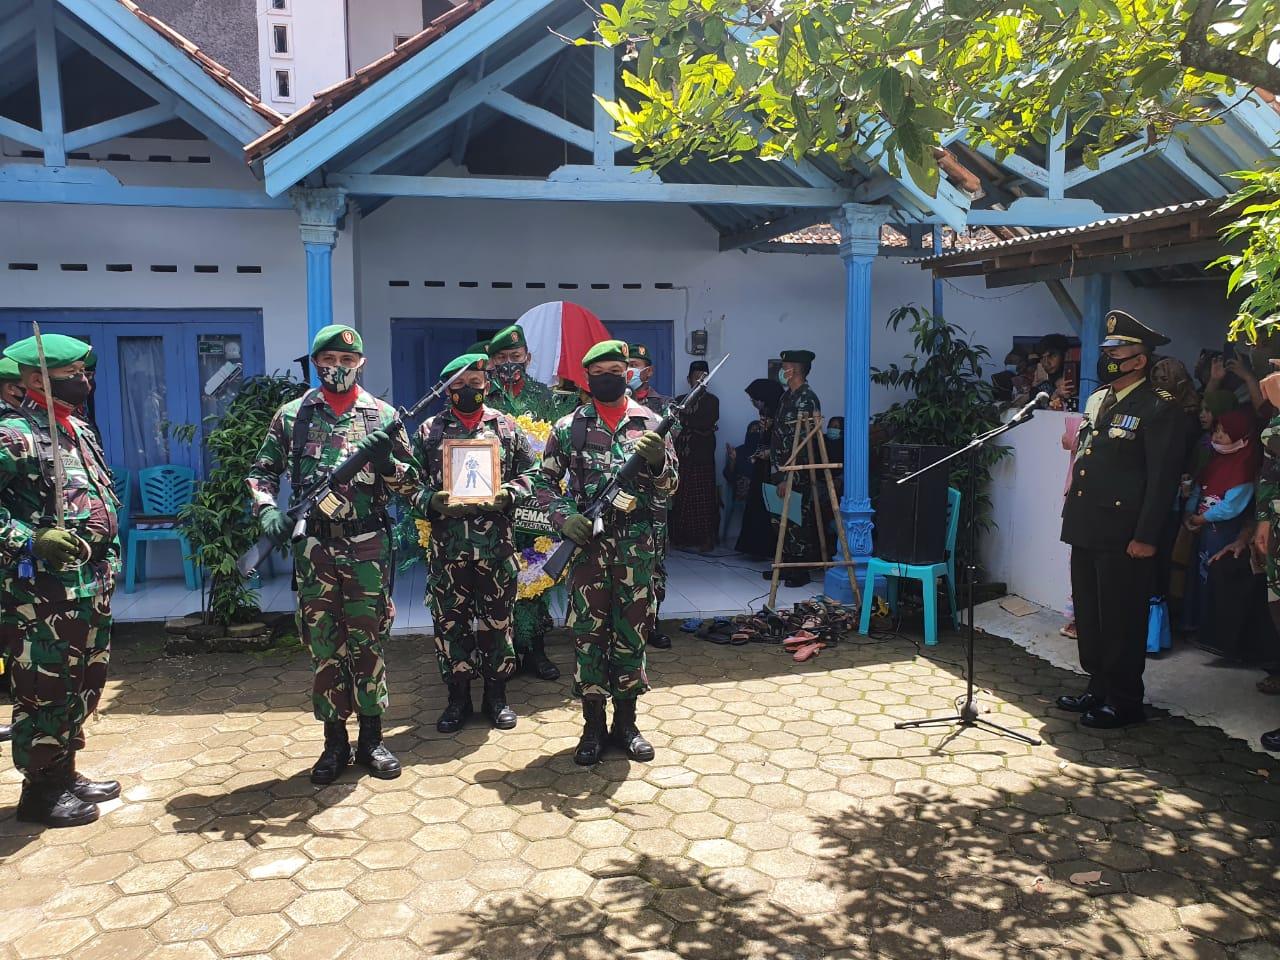 Kodim Pemalang Gelar Upacara Pemakaman Secara Militer Pelda (purn) Sarwoto